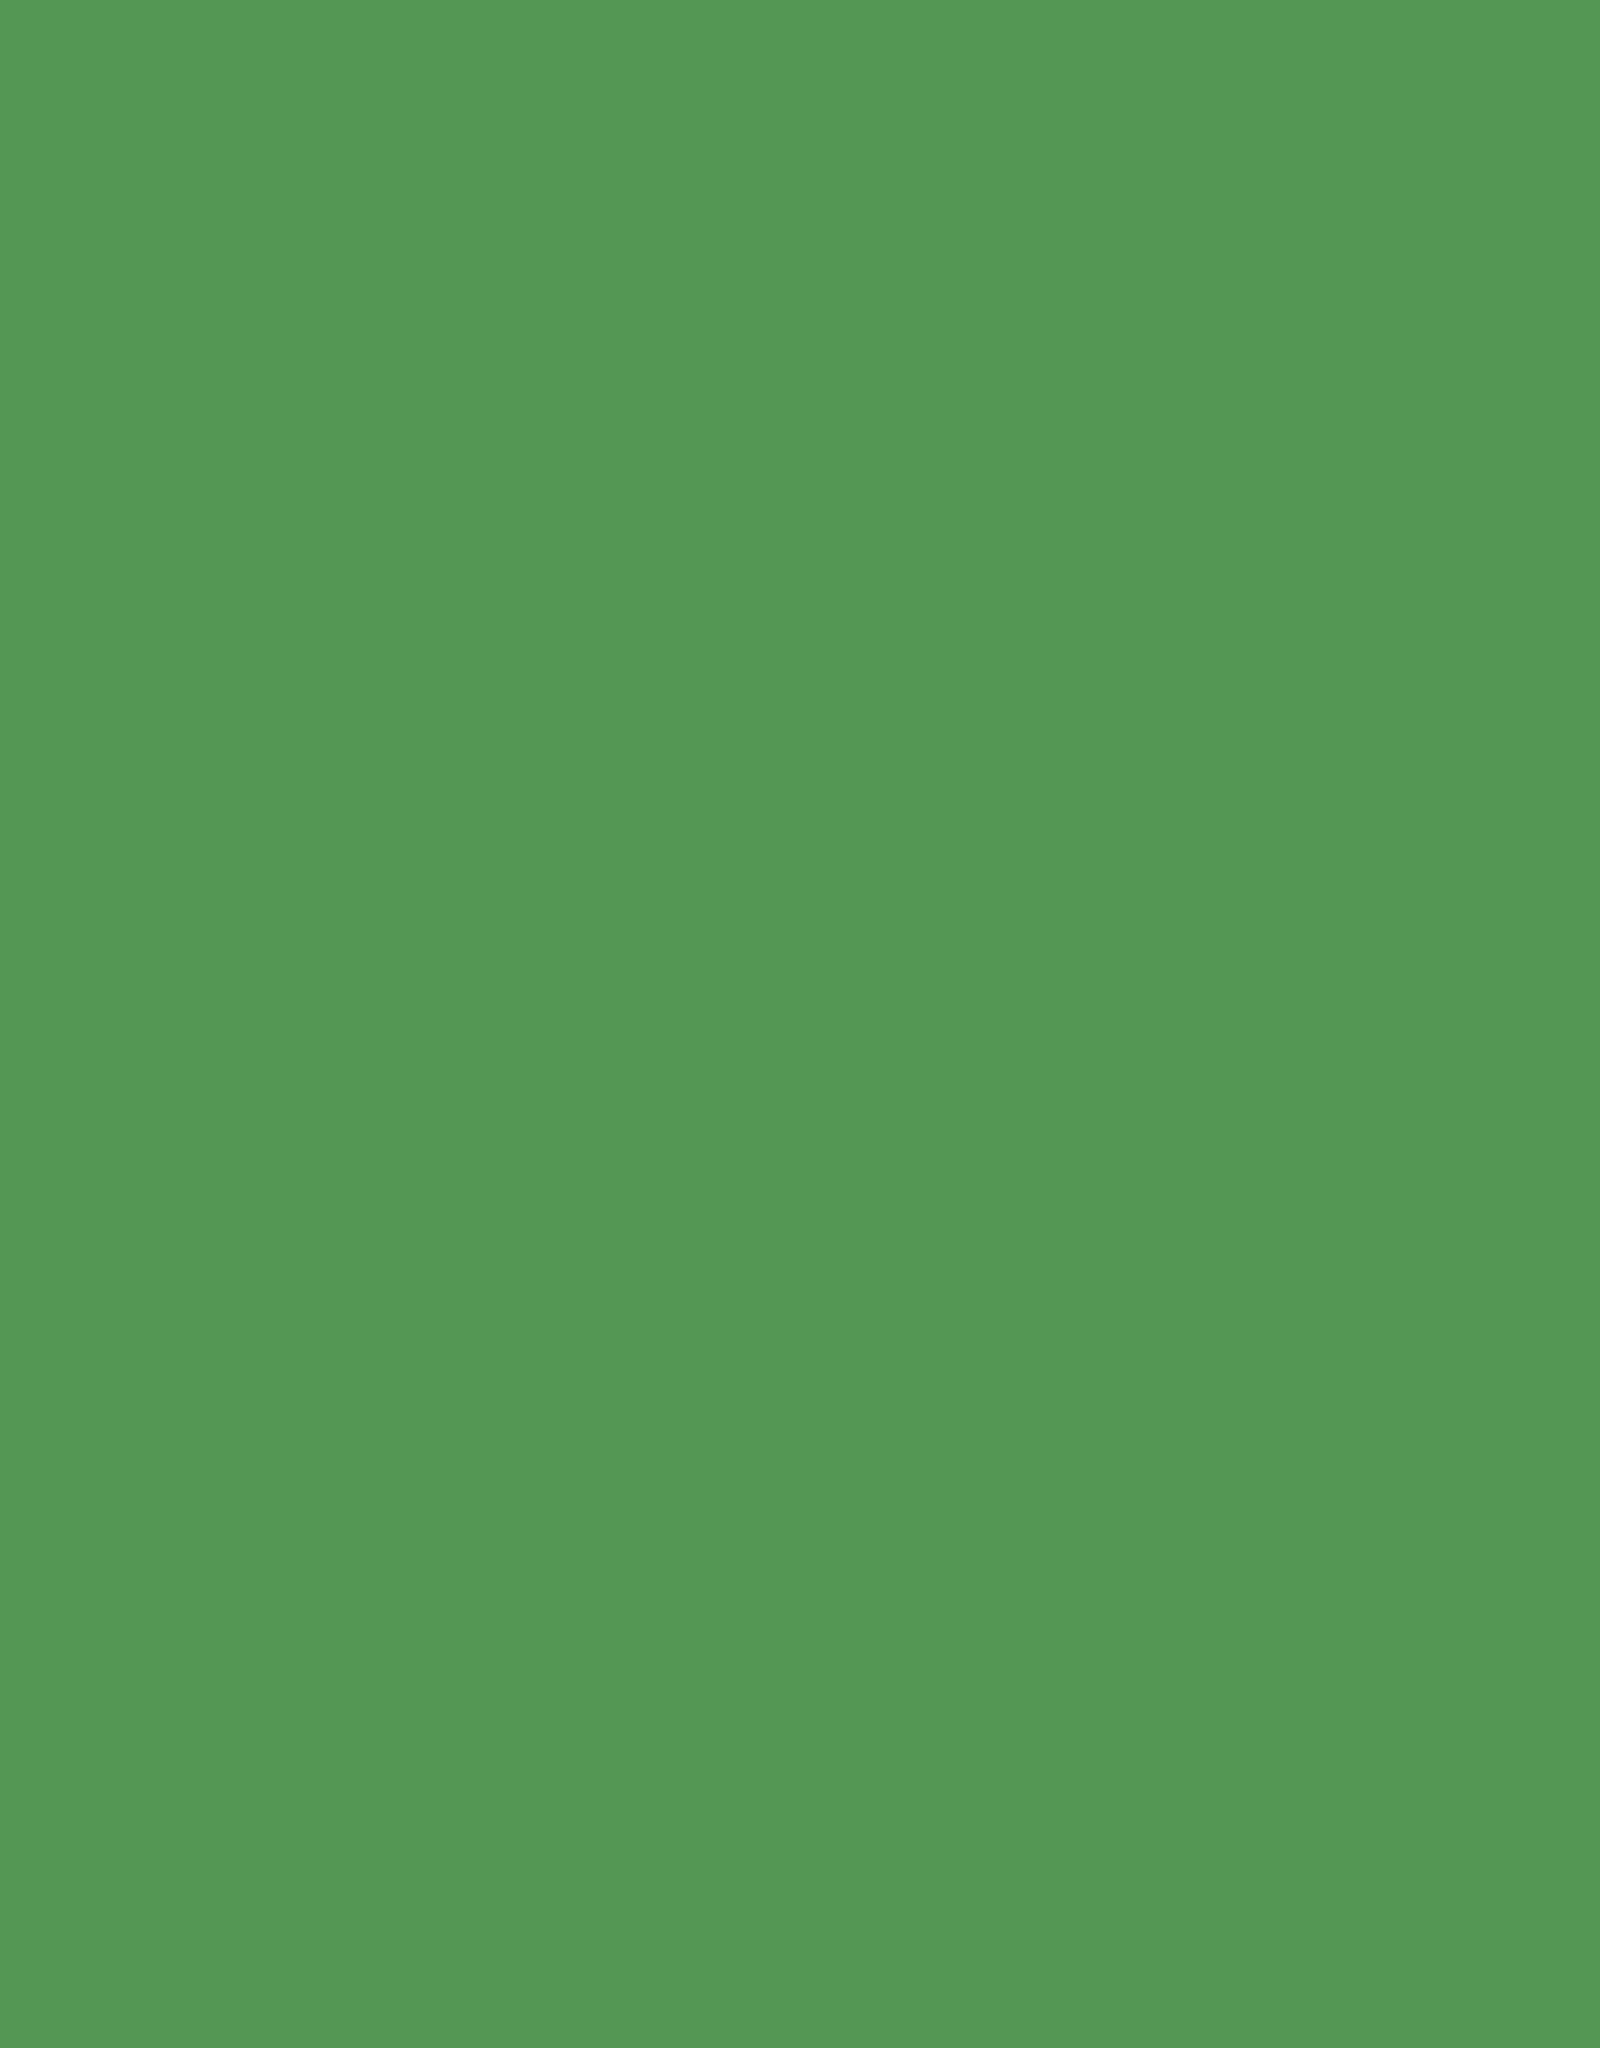 Superior Seamless Superior Seamless 4' Stinger #54 (Chroma Key compatible)